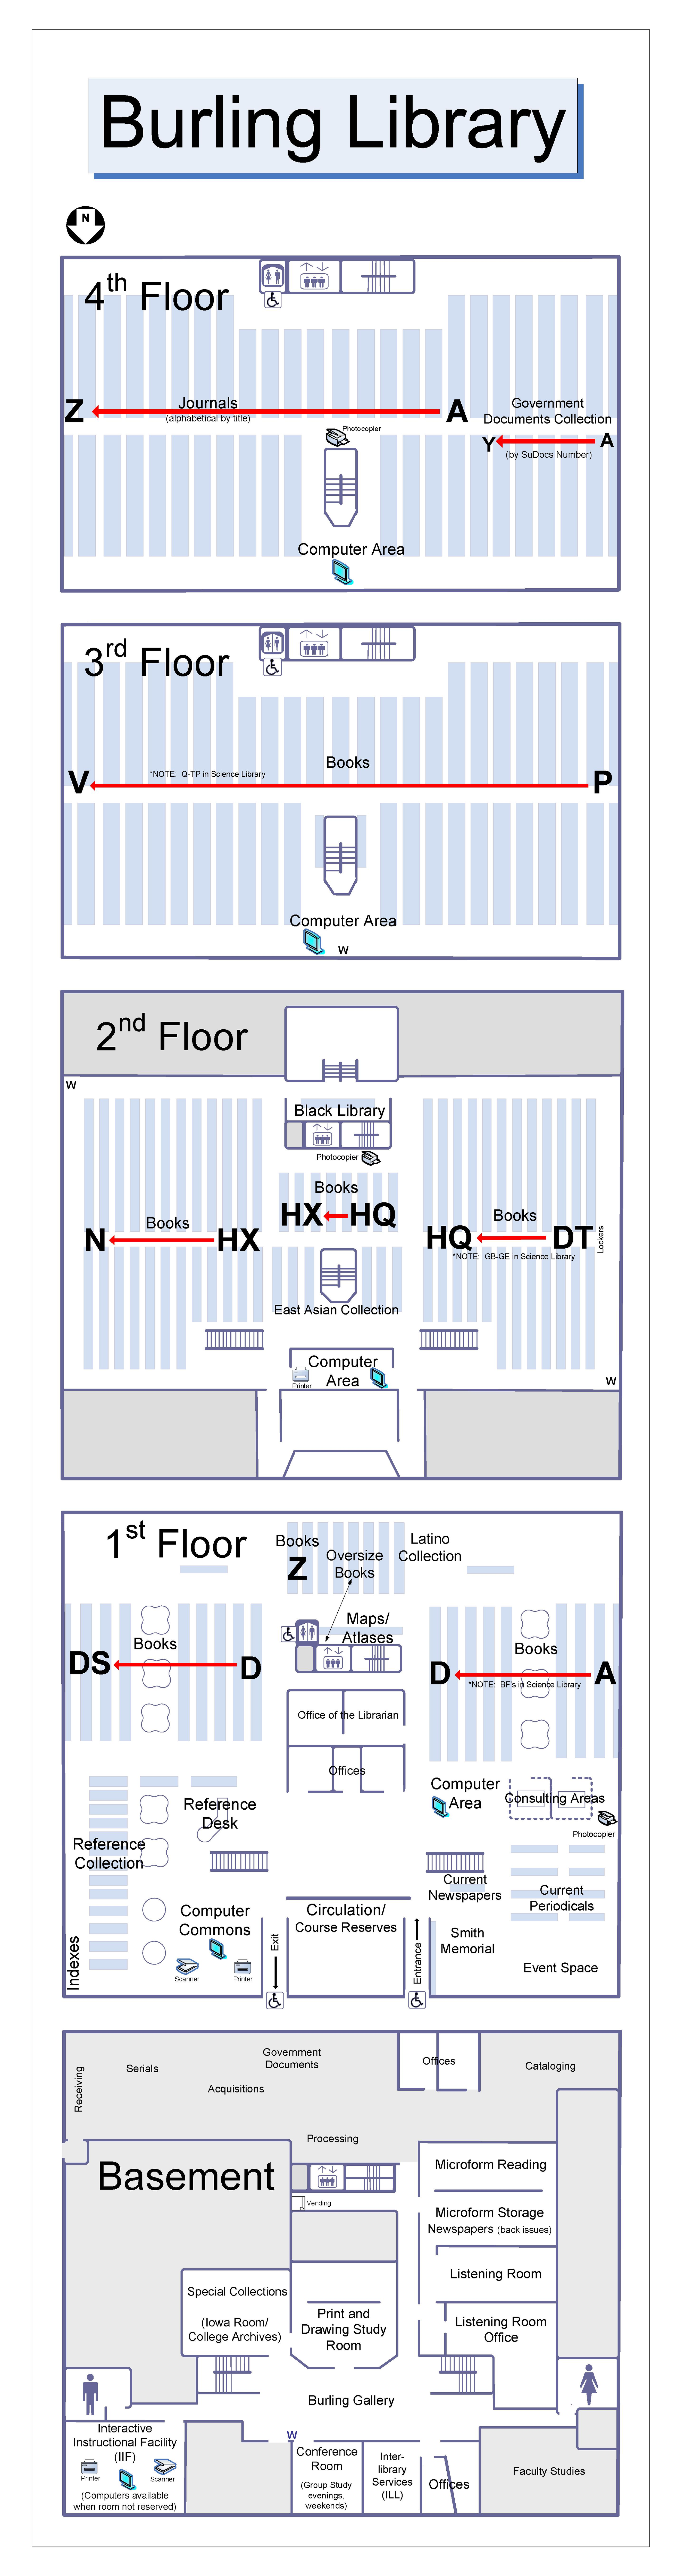 Burling Library Floorplan